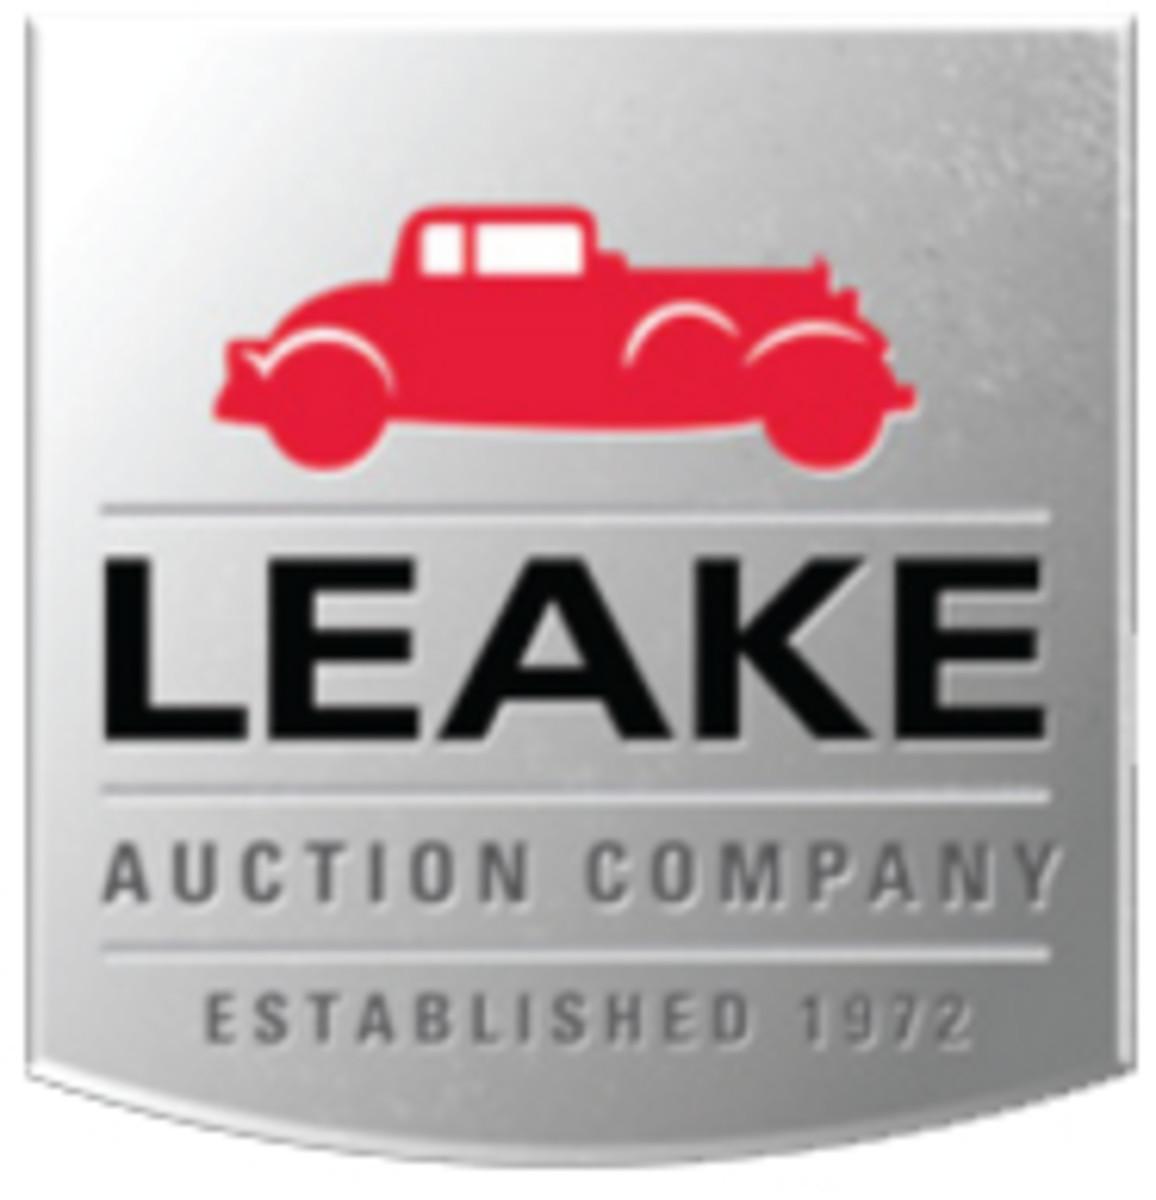 Leake logo